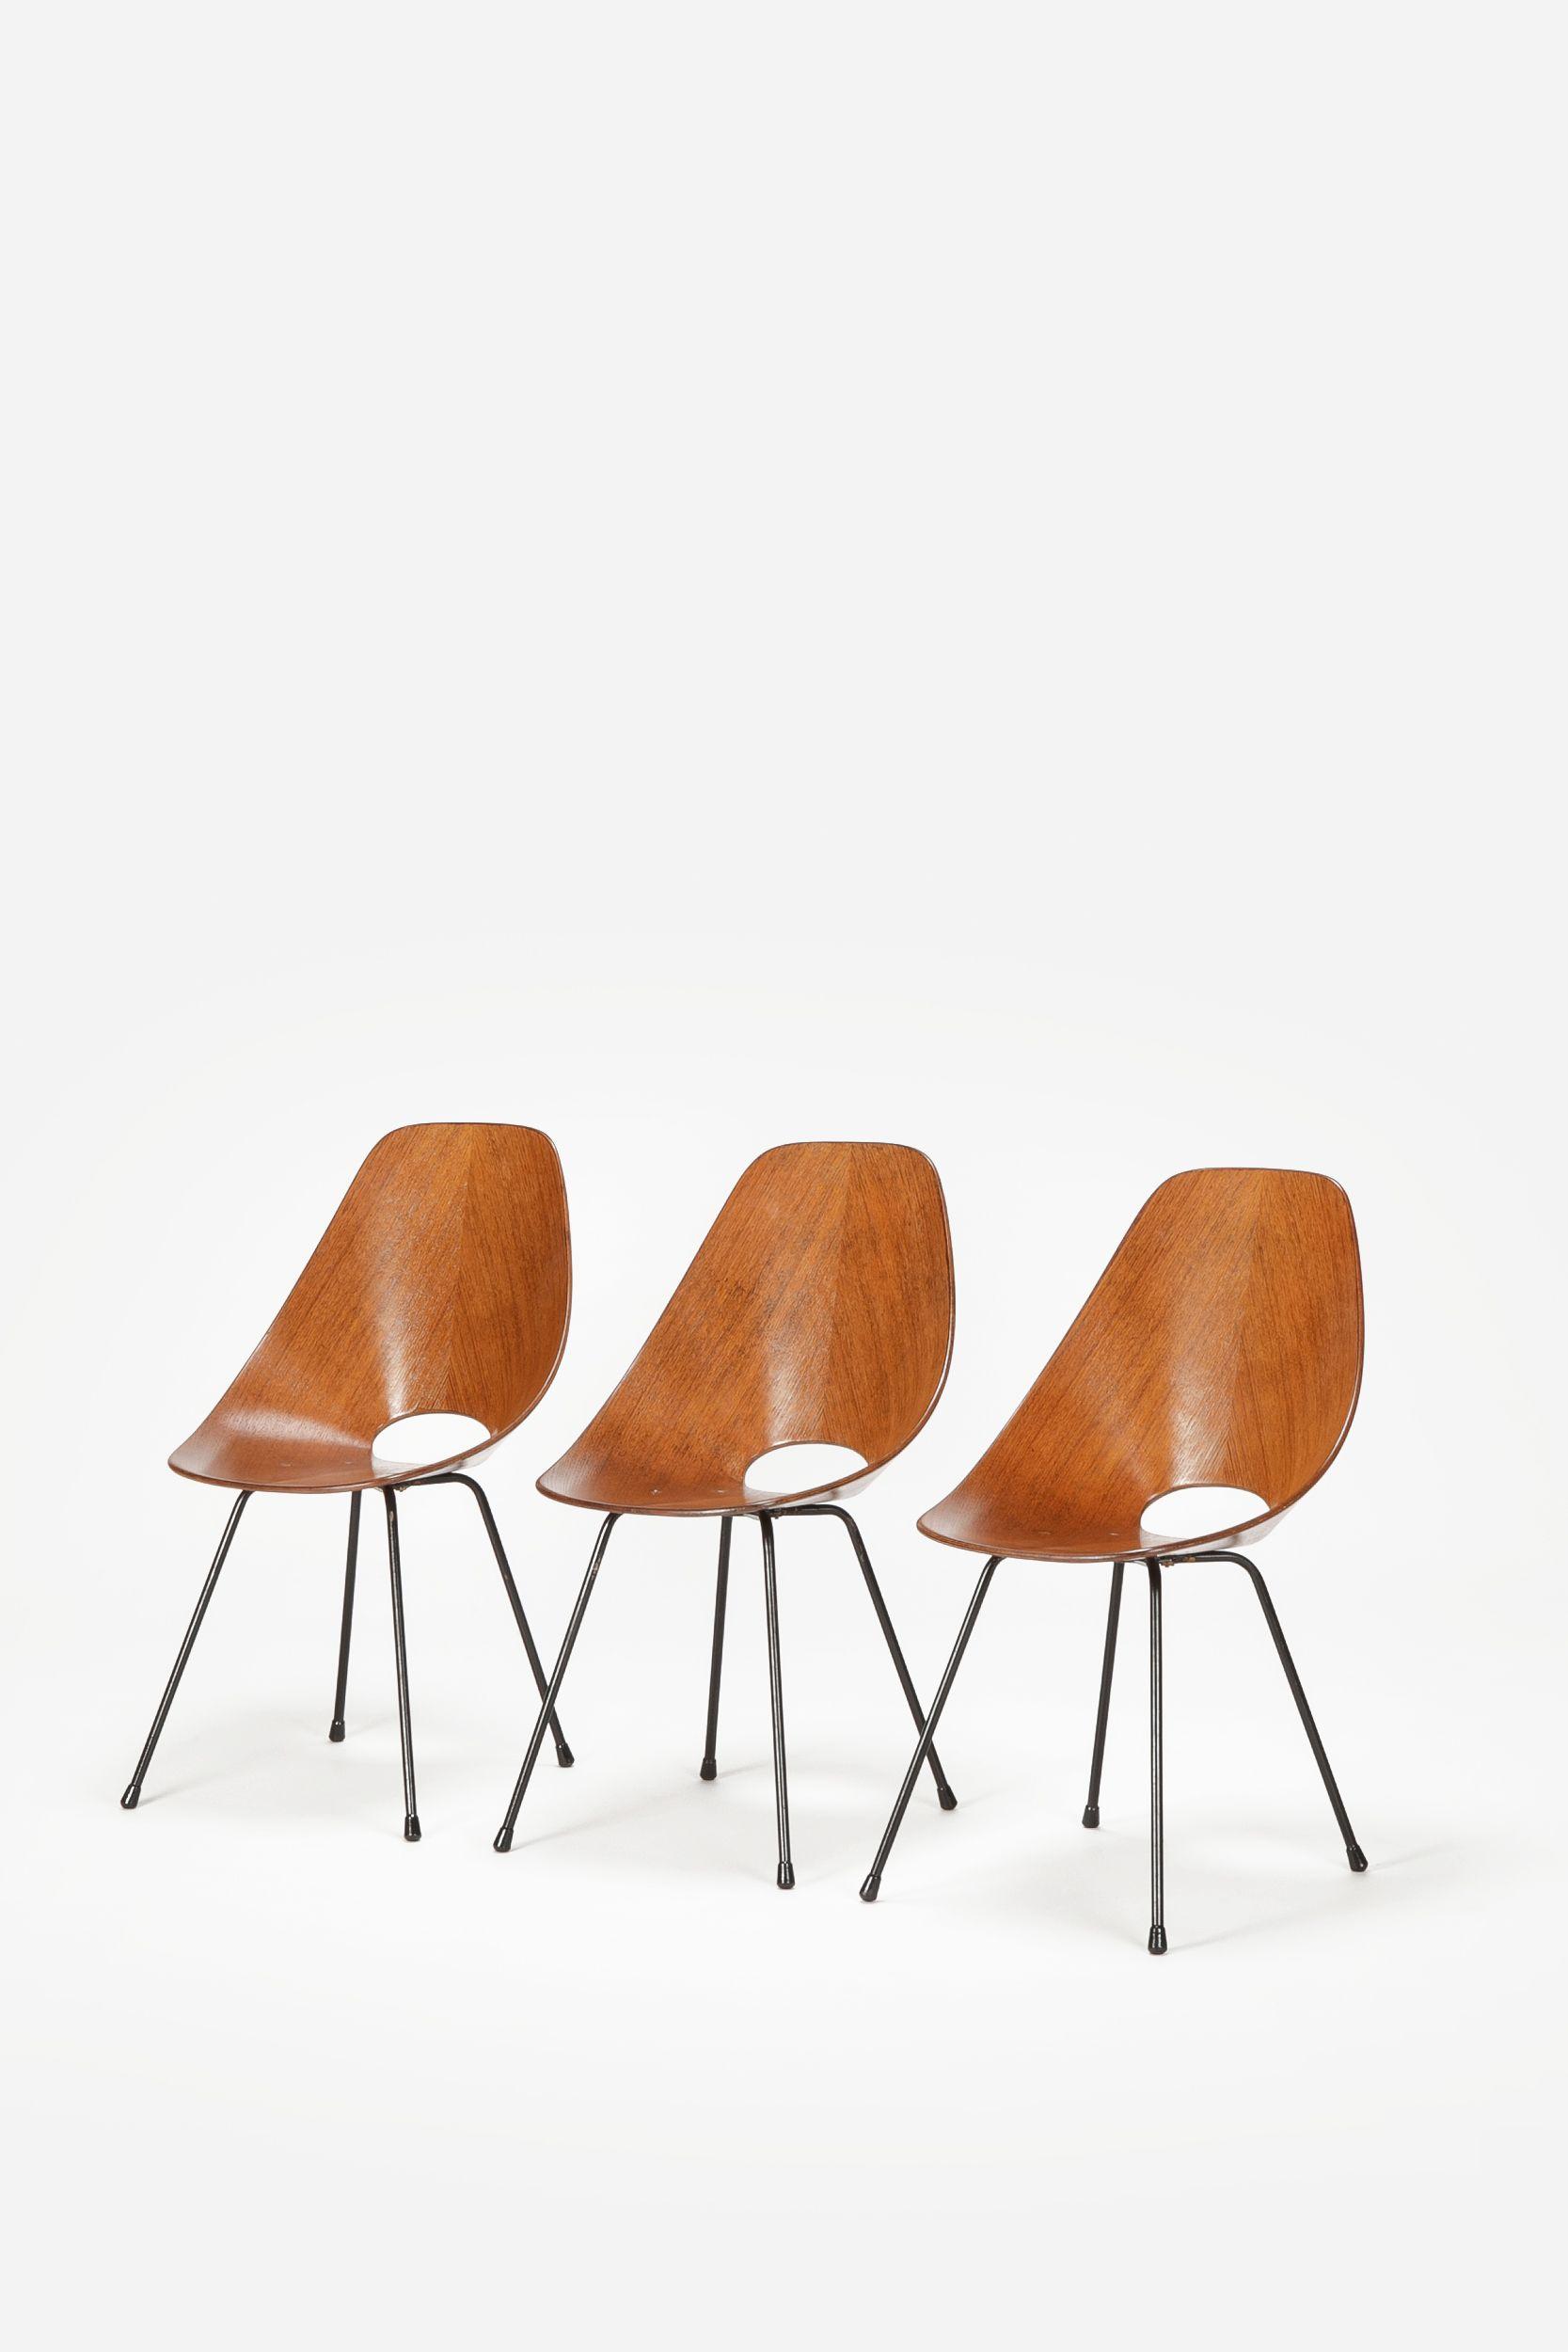 3 Medea Chairs Vittorio Nobili 50 s Interior Style